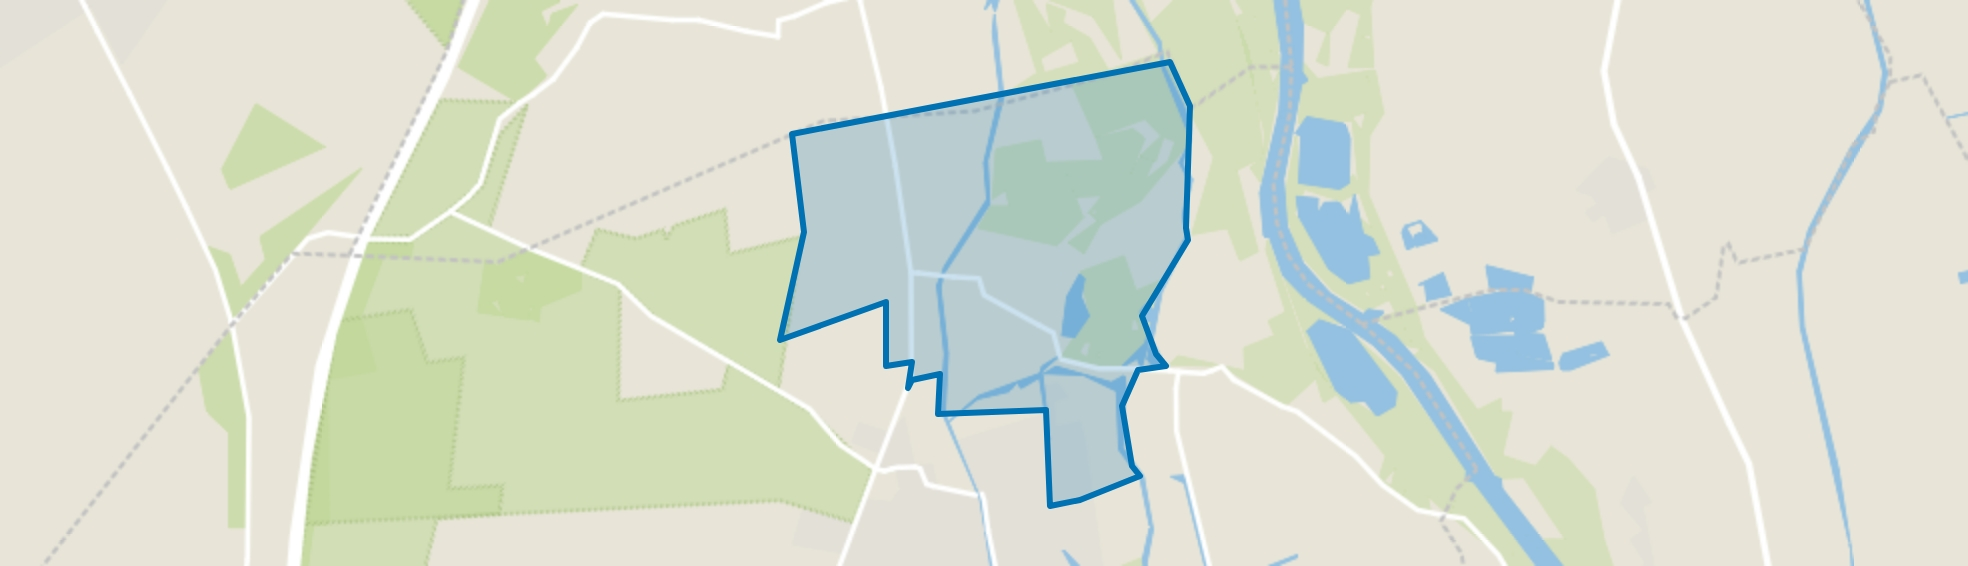 Verspreide huizen Wapenveld-Noord, Wapenveld map